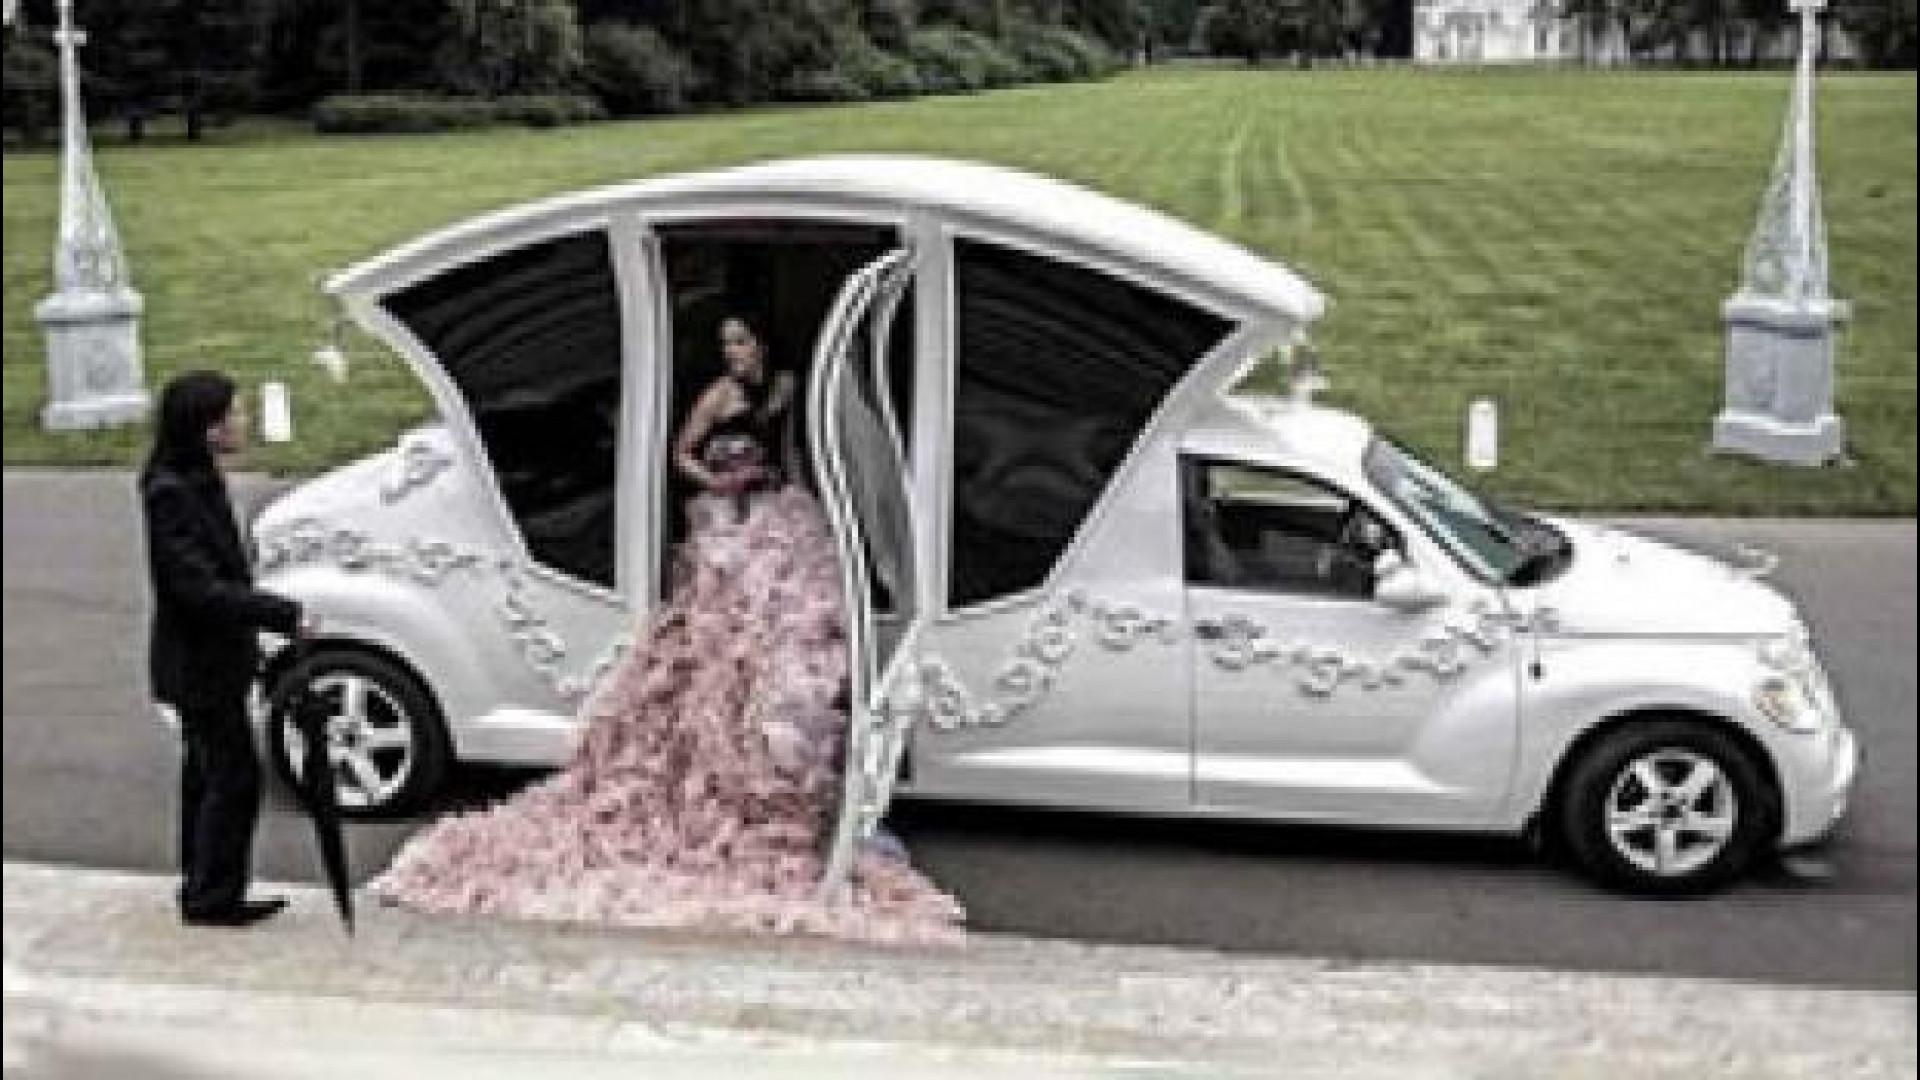 Letto Carrozza Cenerentola : Chrysler pt cruiser come la carrozza di cenerentola